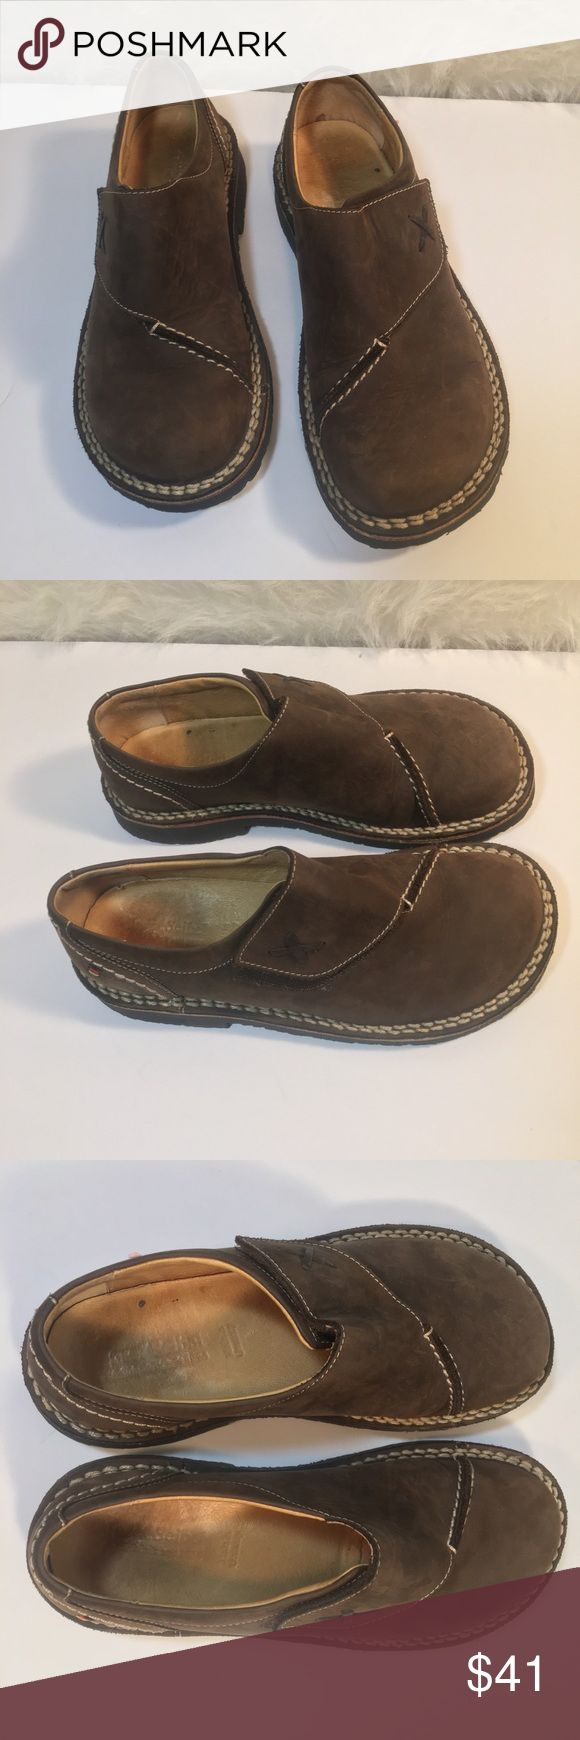 Josef Seibel Velcro loafers  slip ons 38 Josef seibel brown leather Velcro loafers  shoes size 38 Josef Seibel Shoes Flats & Loafers